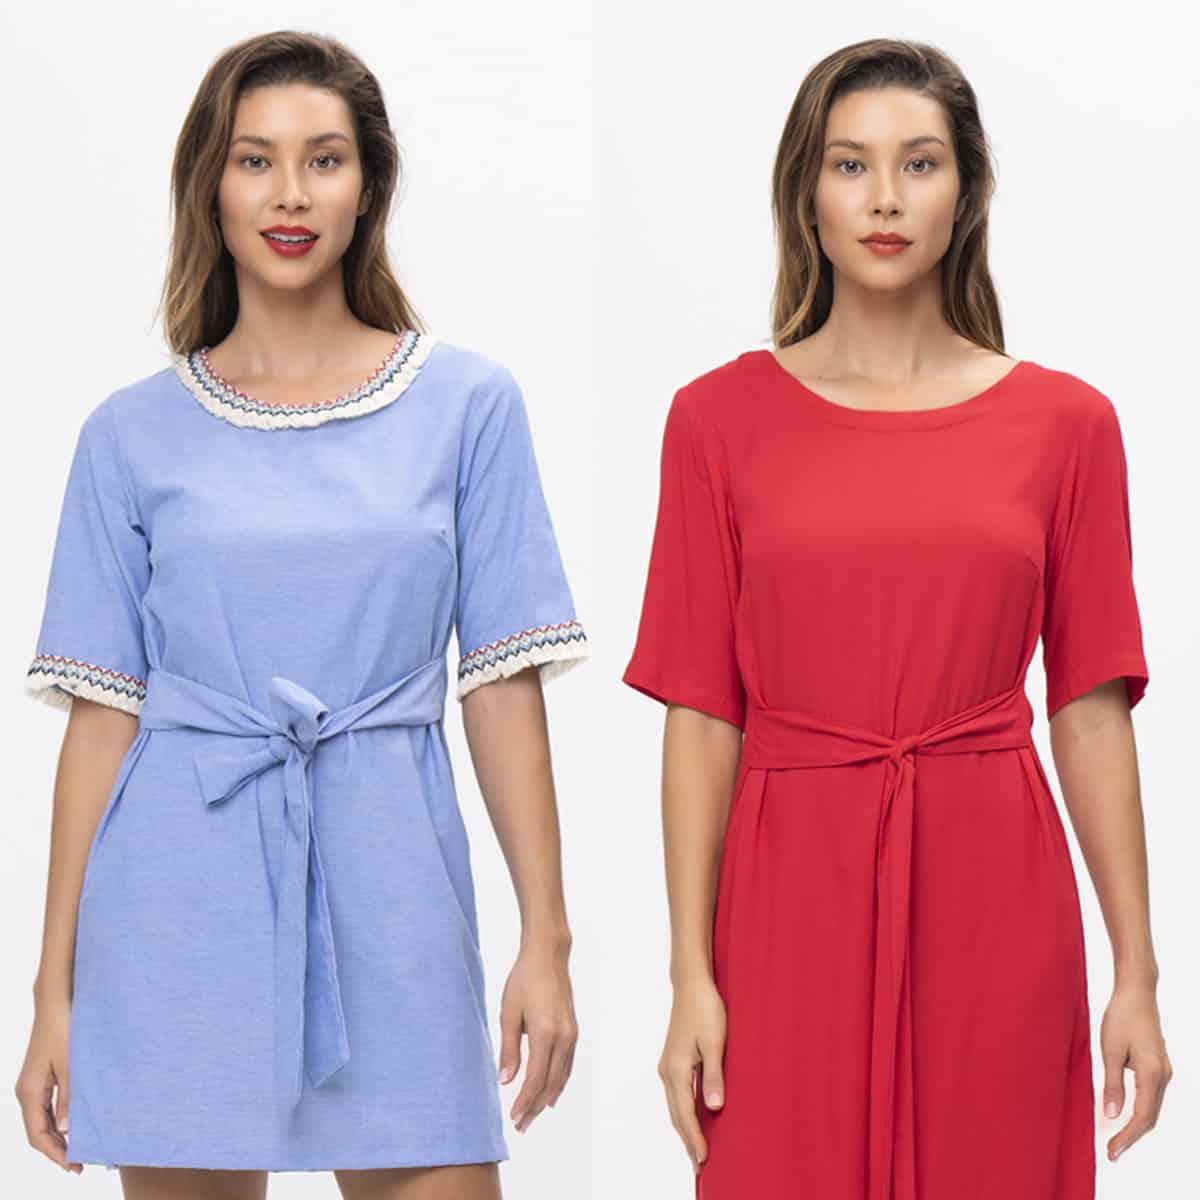 Fabric Drape Fabrics That Flatter For Sewing Treasurie